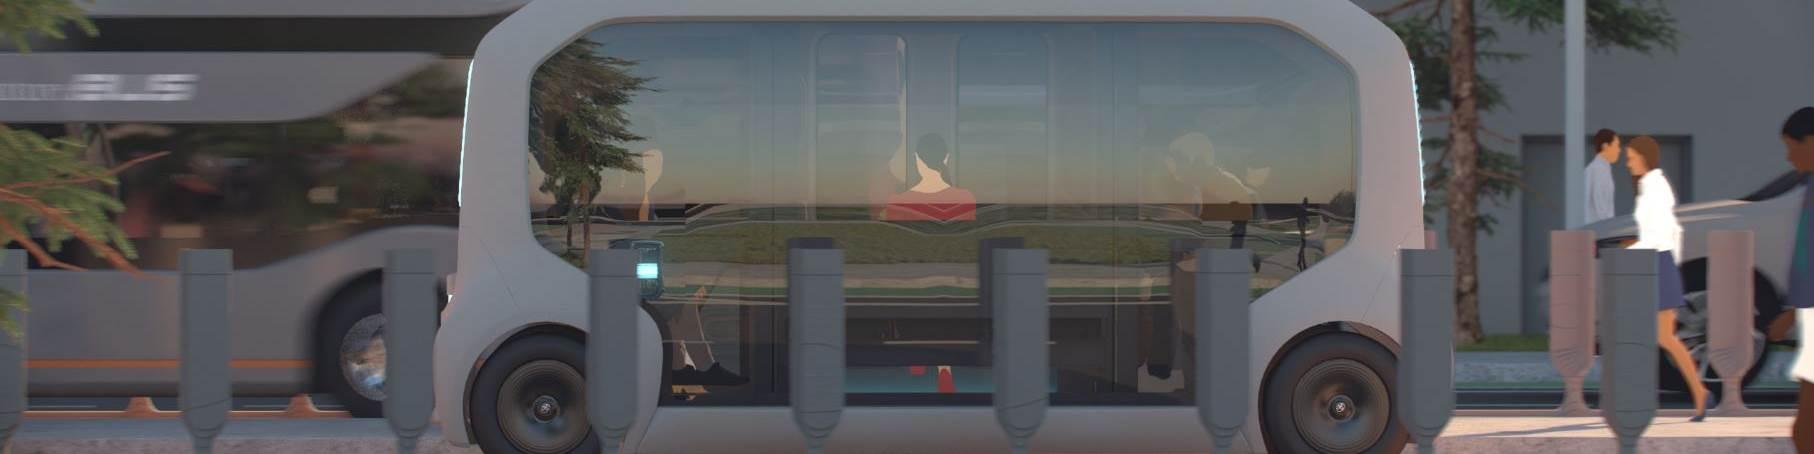 Michigan's Connected and Autonomous Vehicle Corridor